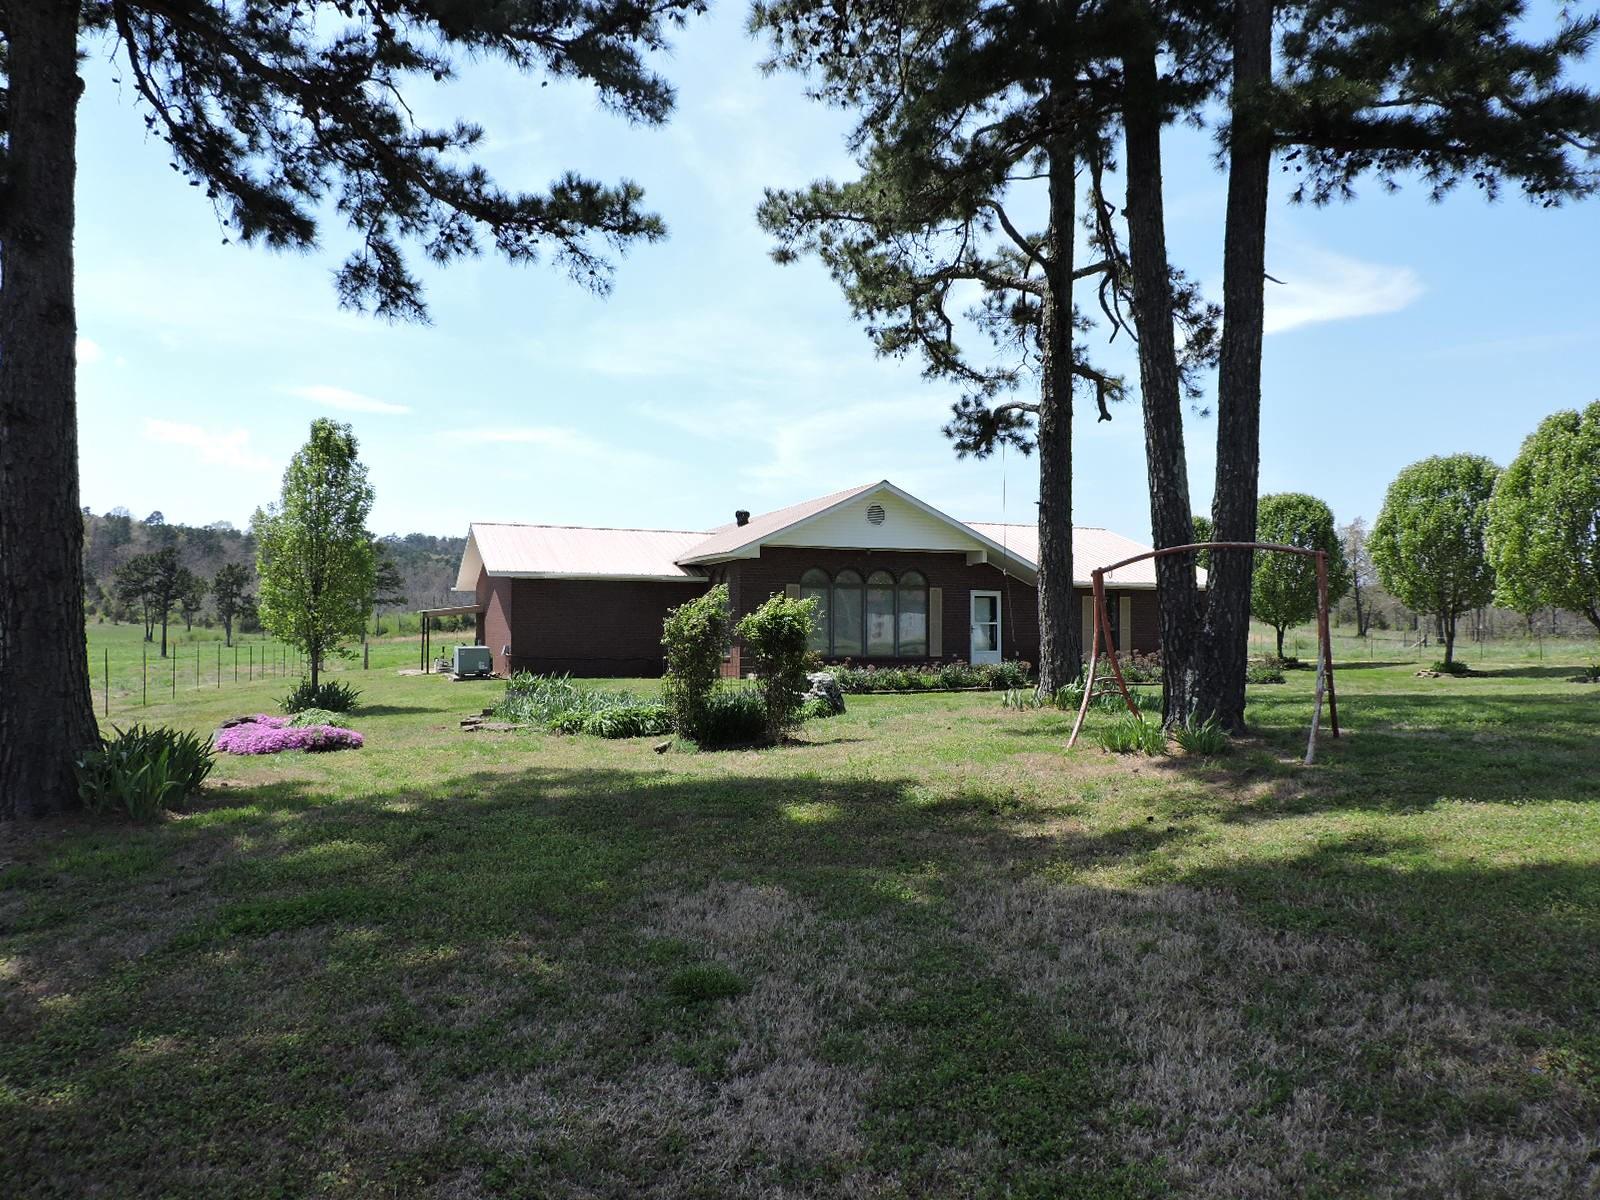 Waldron Arkansas Real Estate - Homes, Farms, Ranches, Land